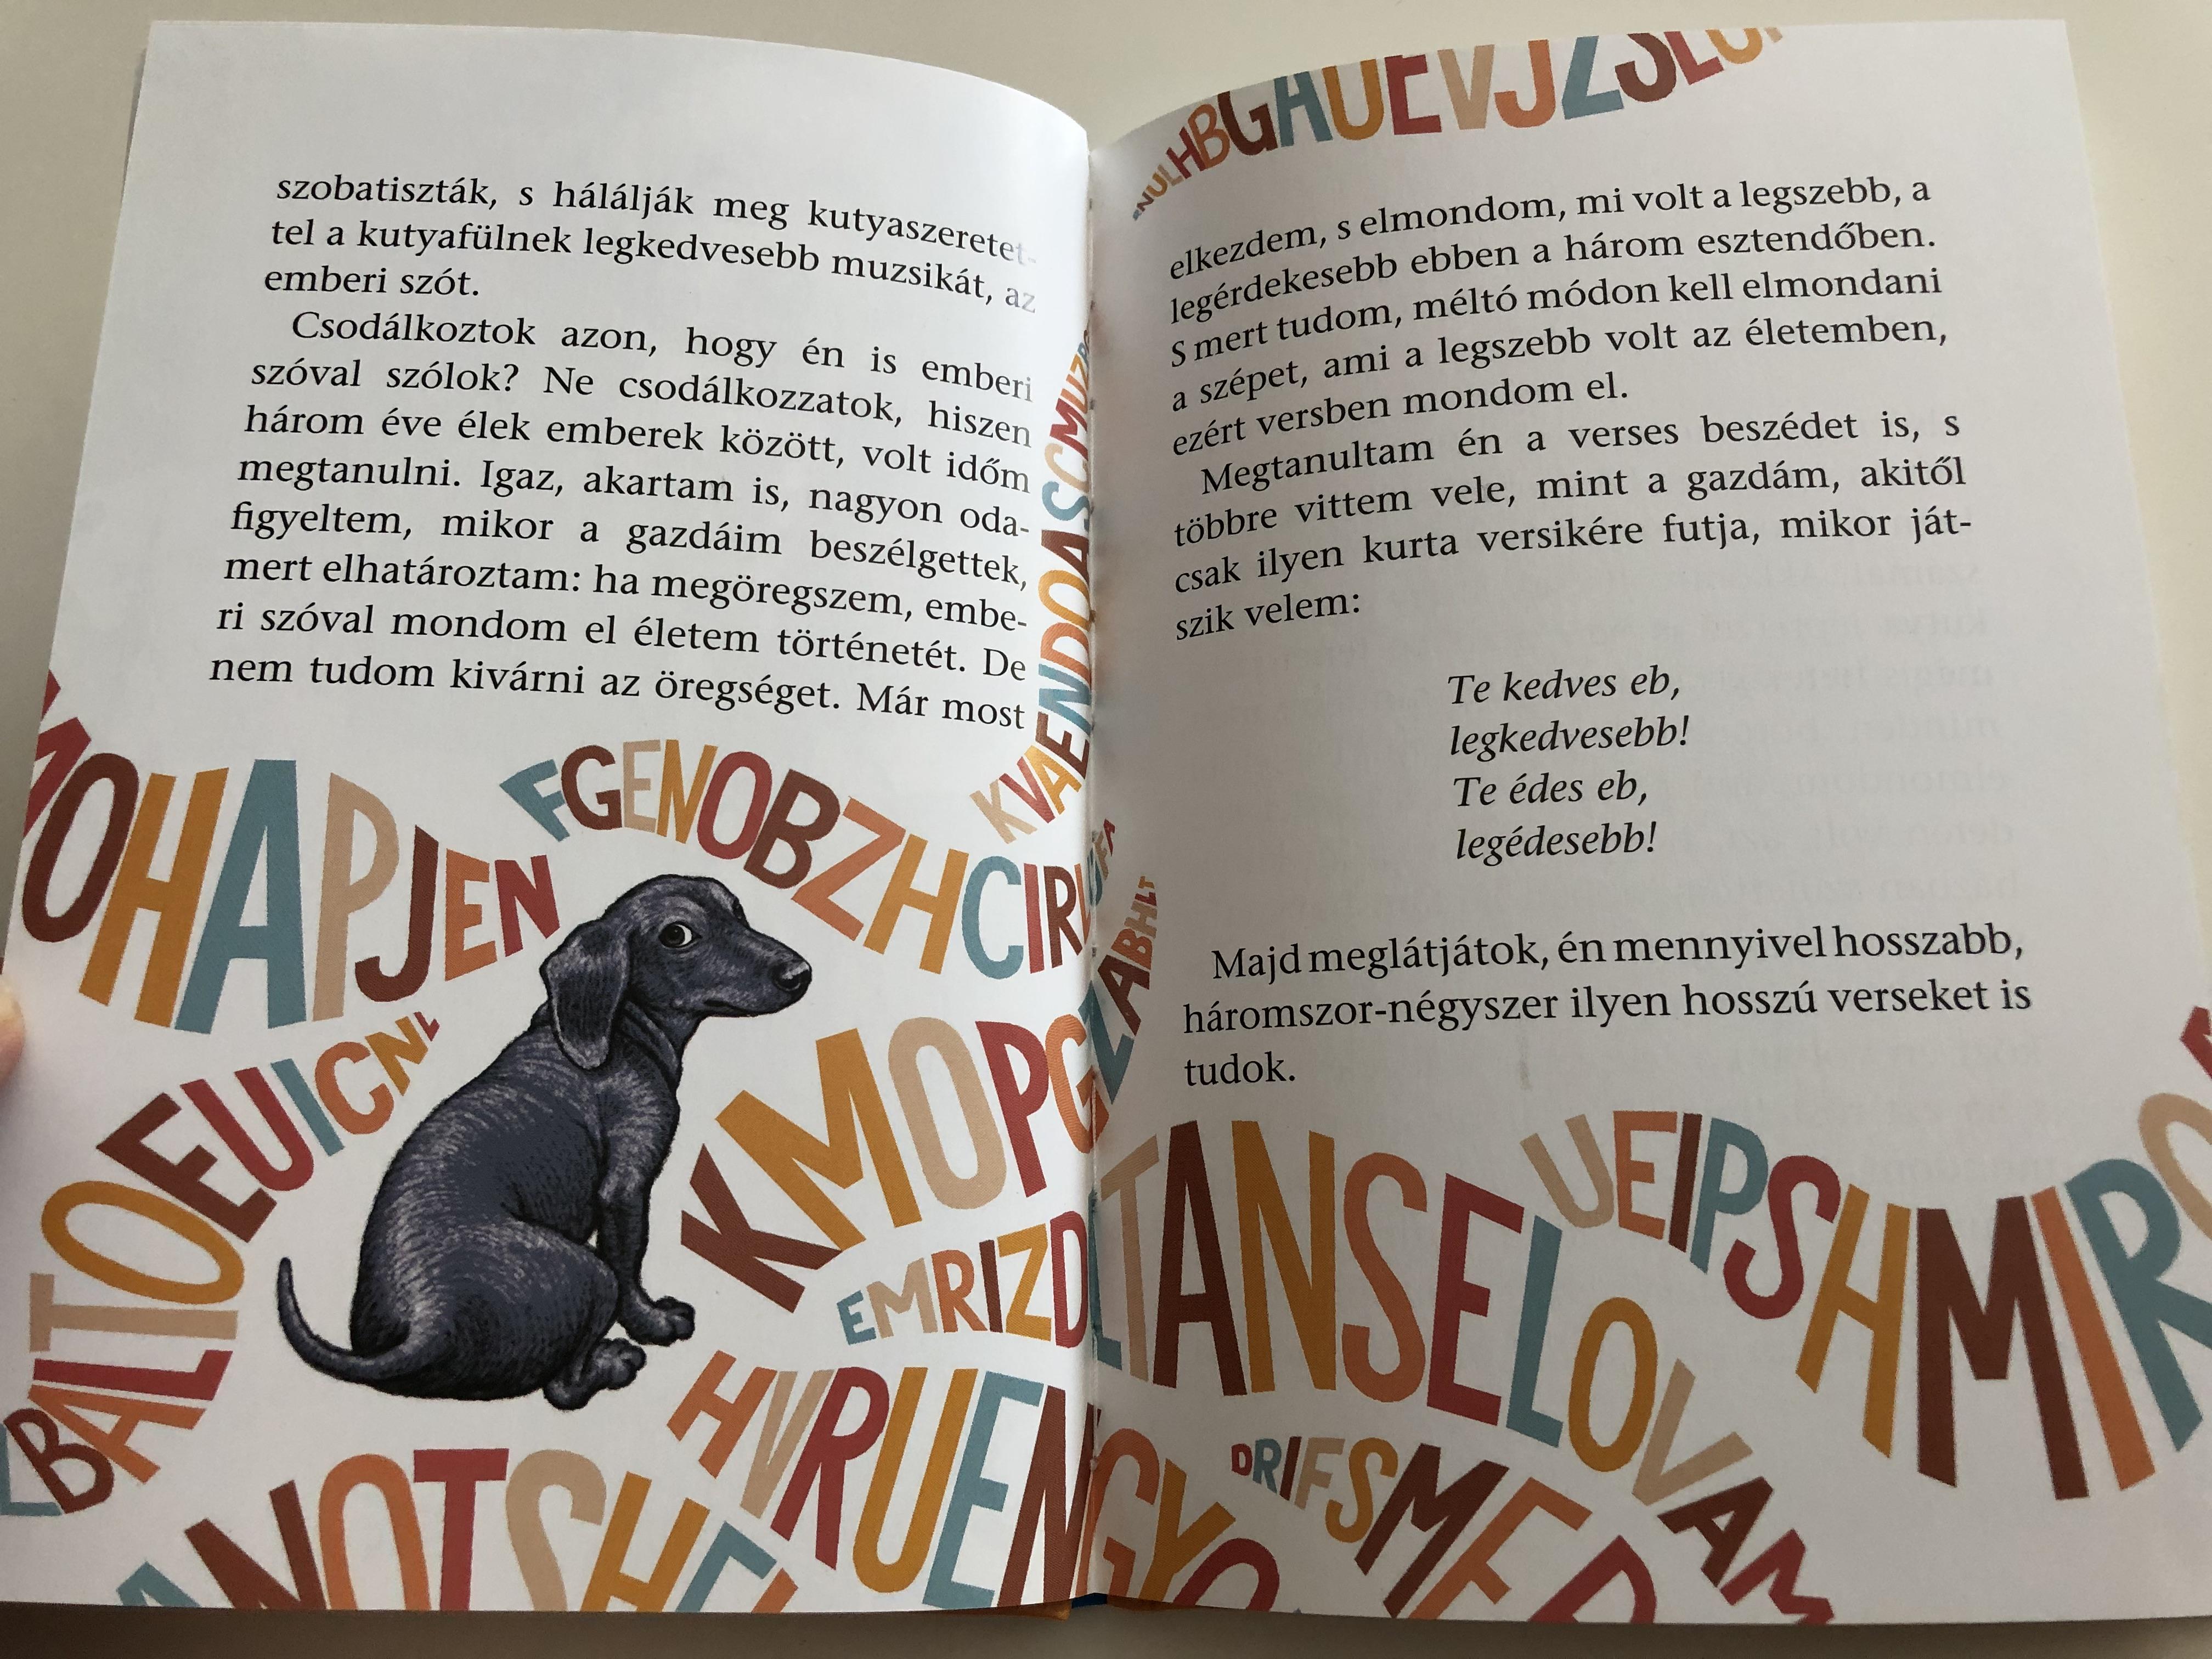 egy-kutya-eml-kei-by-zelk-zolt-n-memories-of-a-dog-hungarian-storybook-for-3rd-graders-m-r-tudok-olvasni-m-ra-2012-4-.jpg